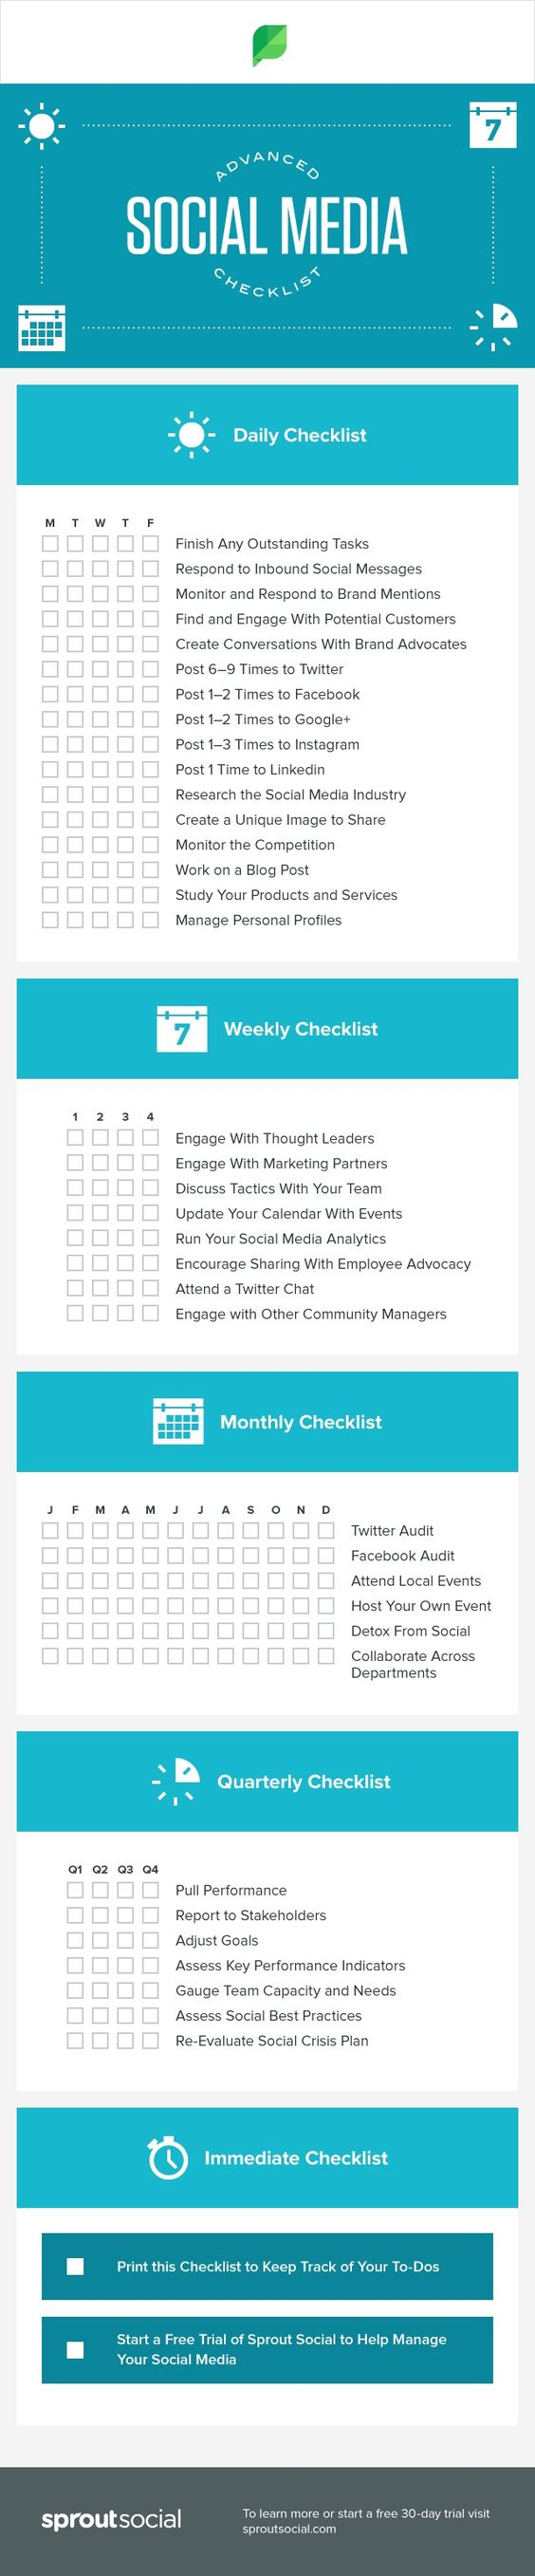 #WeKnowTheWeb #SocialMedia #Marketing #Checklist #Infographic